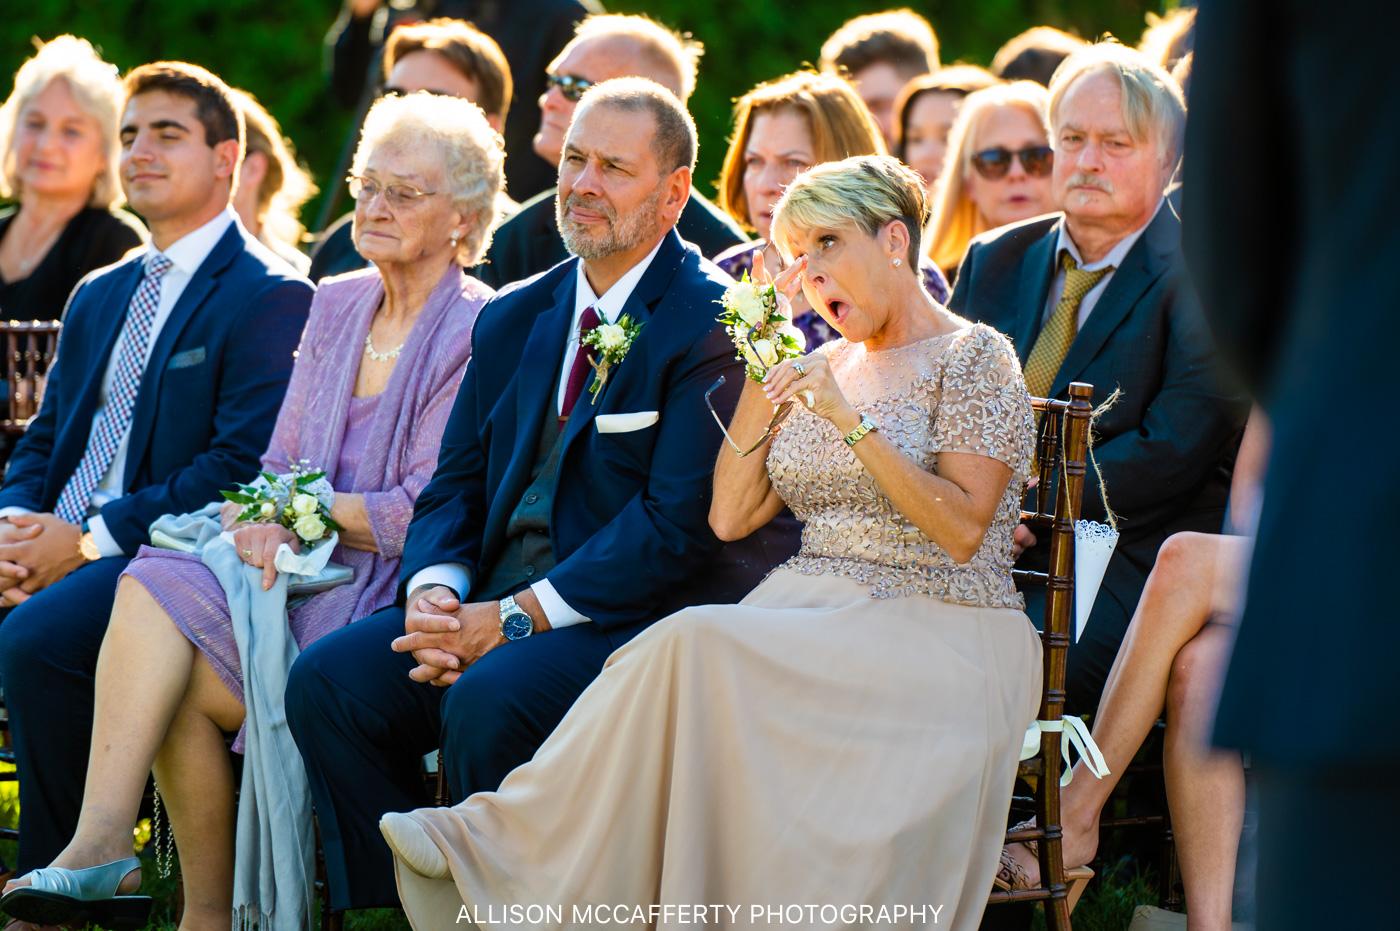 Valenzano Winery Pavilion Wedding Pictures